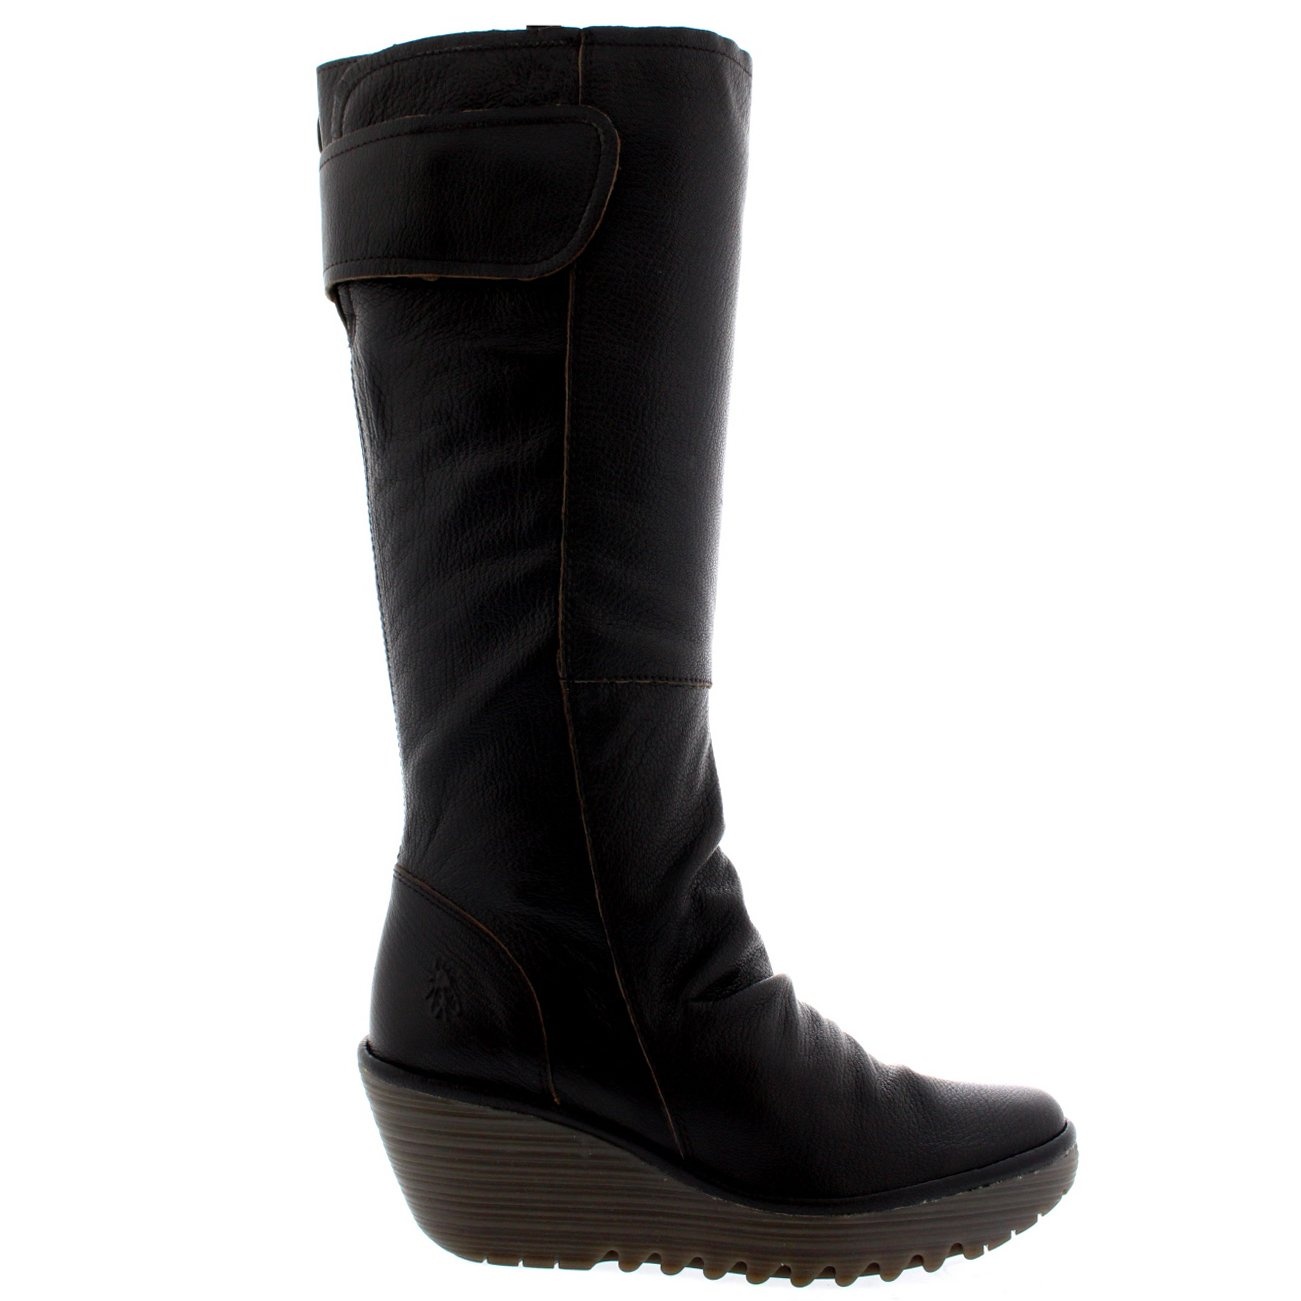 Womens Fly London Yulo Wedge Heel Leather Fashion Knee High Winter Boots B01K51HCA4 US9/EU40|Chocolate